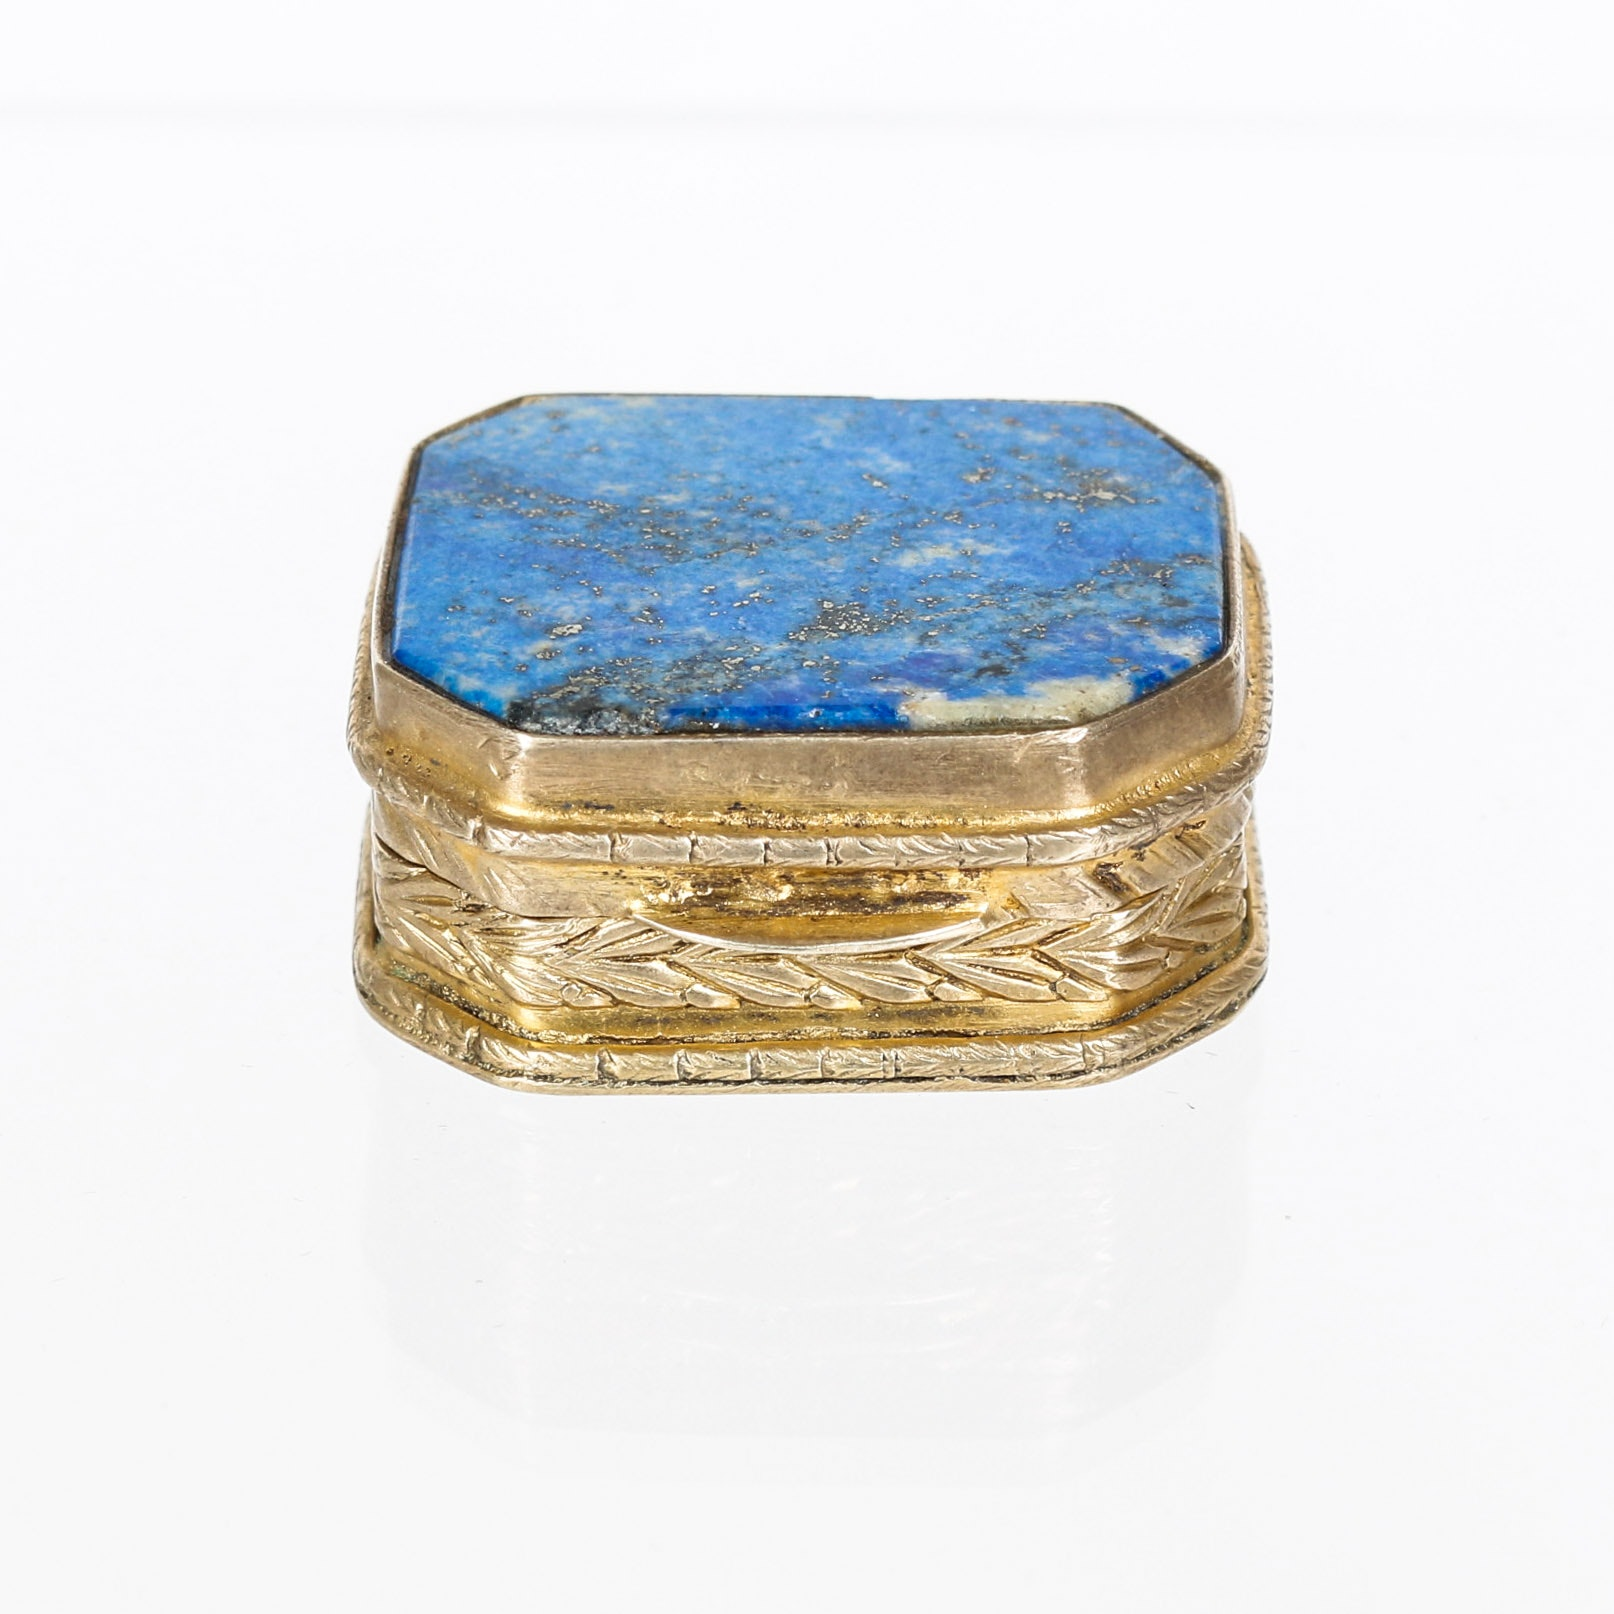 Vintage Lapis Lazuli and Vermeil Pill Box